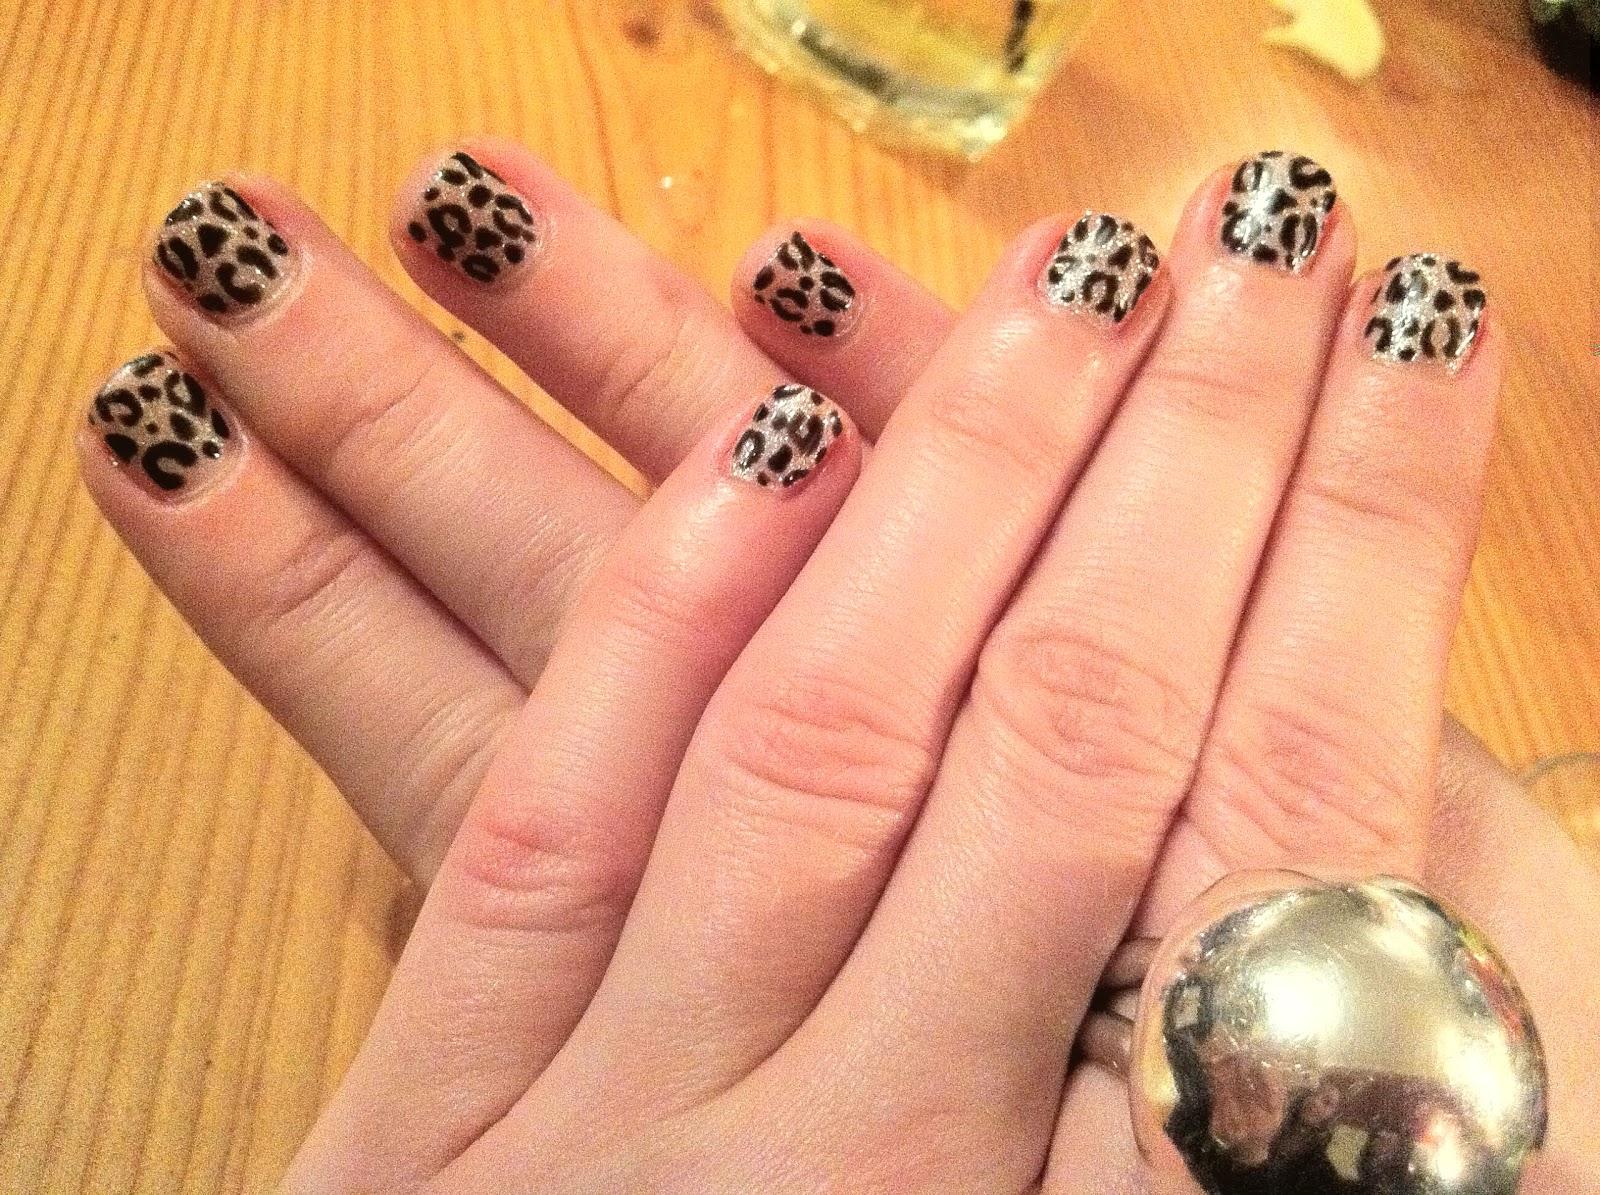 Leopard toe nail designs best leopard 2017 60 cute pretty toe nail art designs prinsesfo Gallery